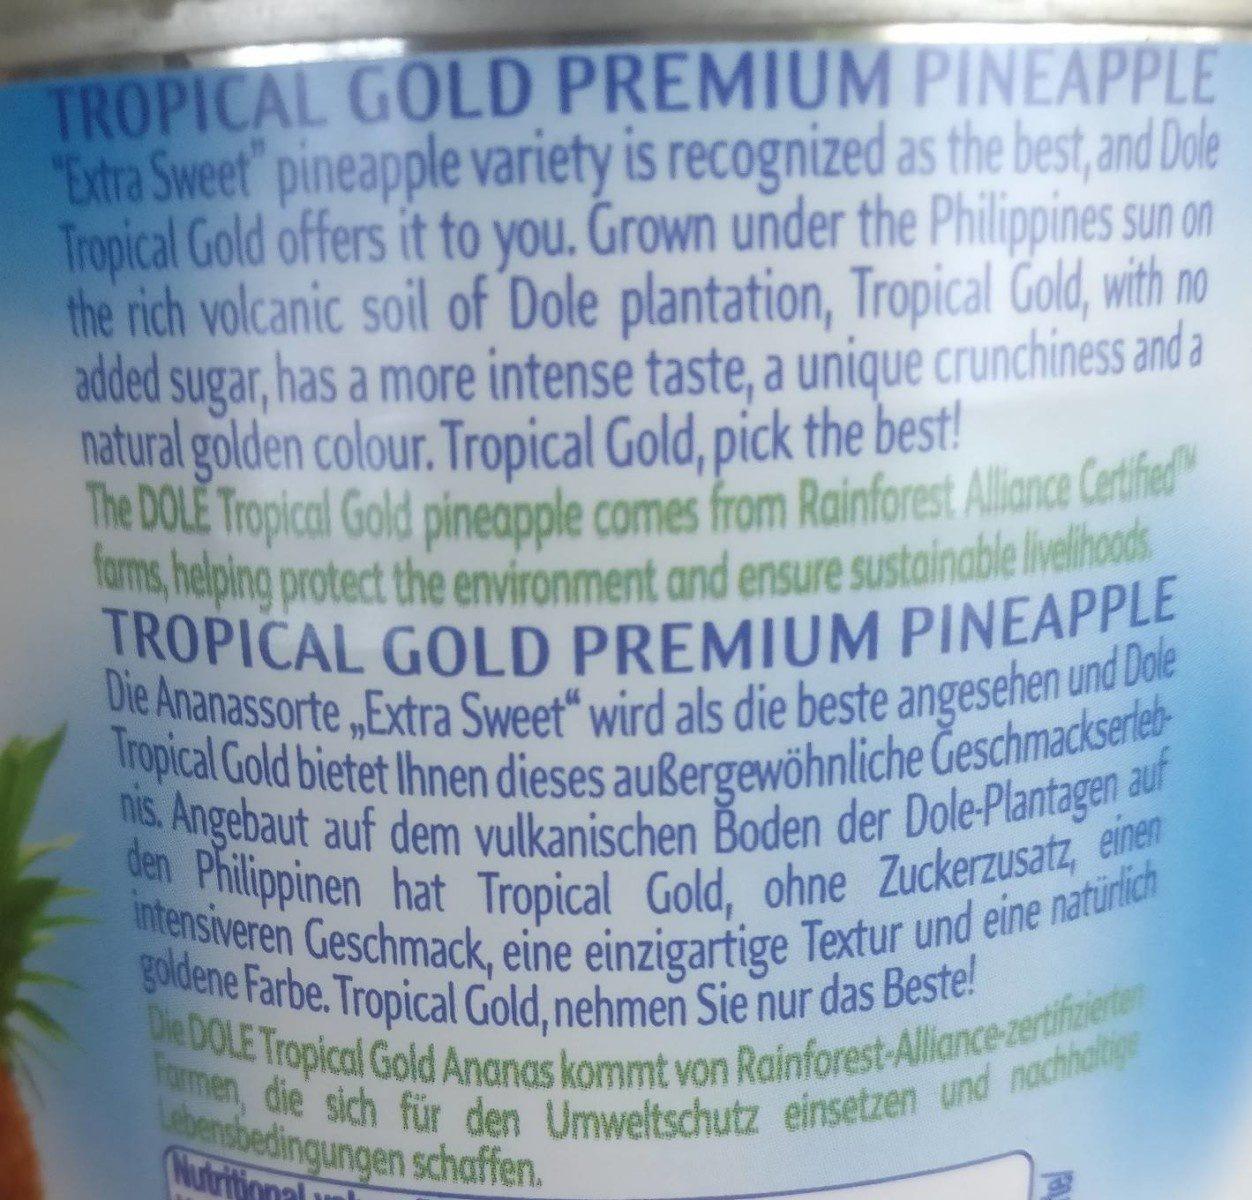 Tropical Gold Premium Pineapple - Ingredients